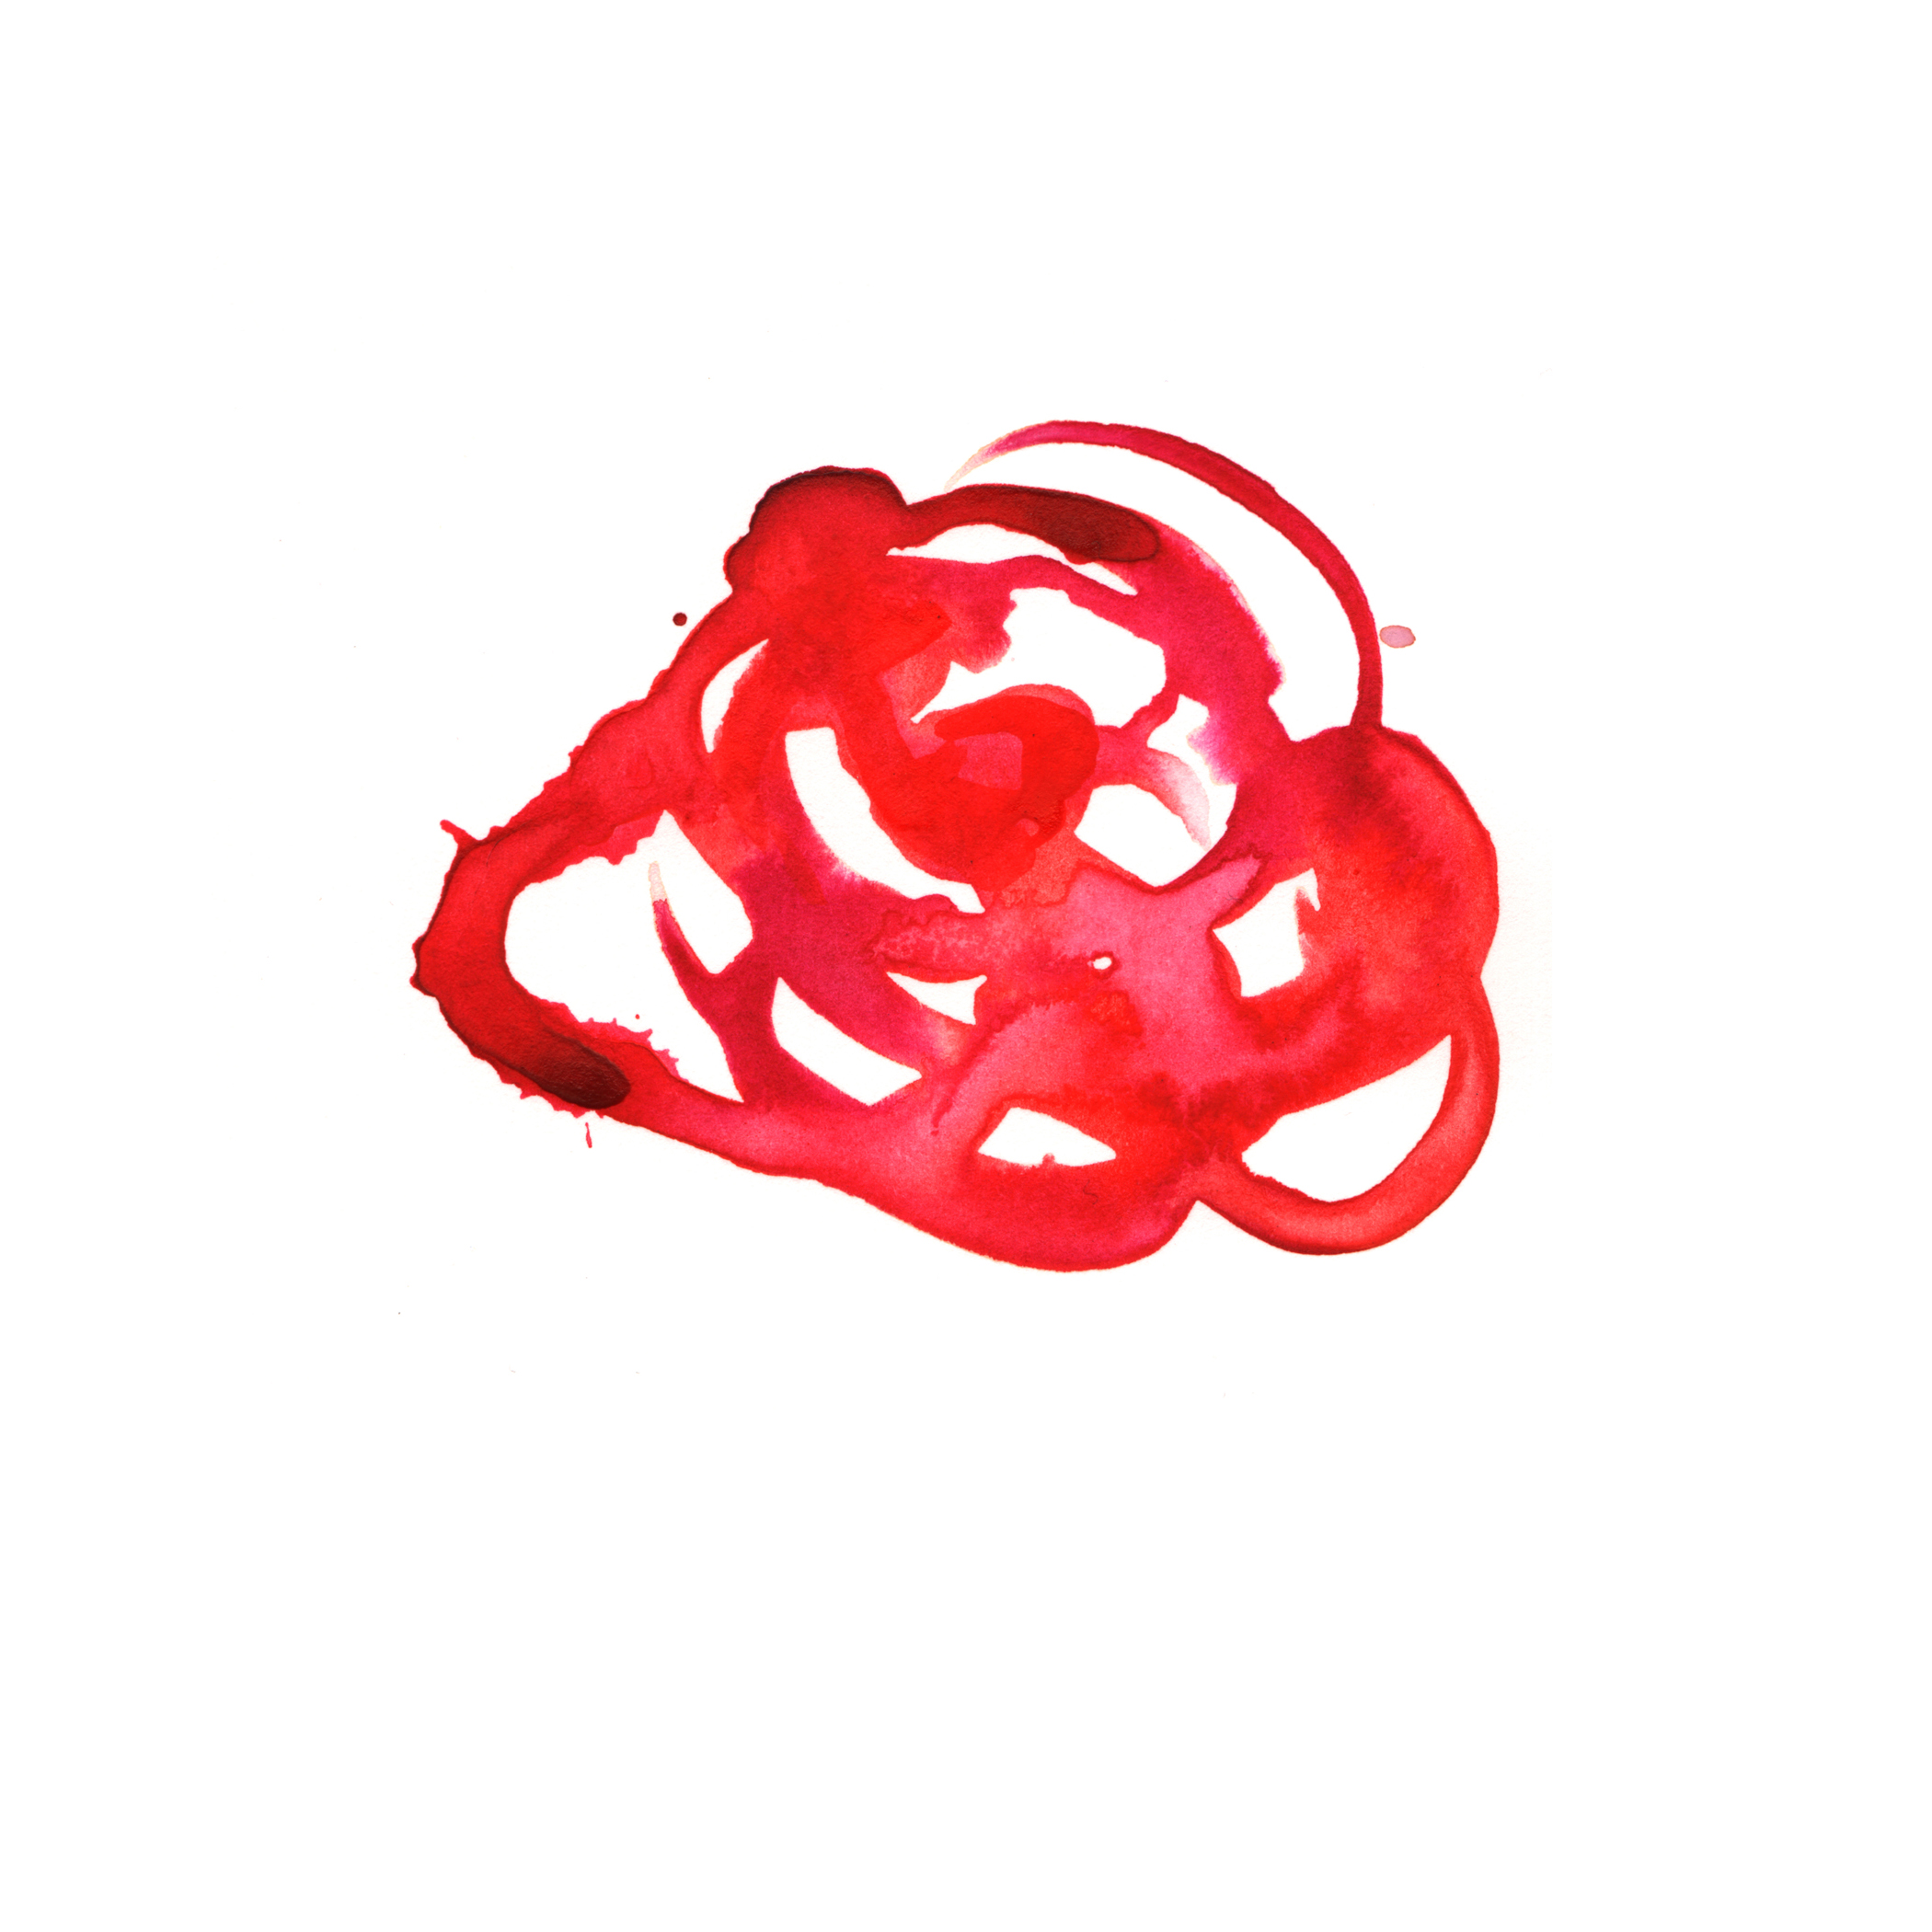 32.Red.Rose.3.12.14.jpg